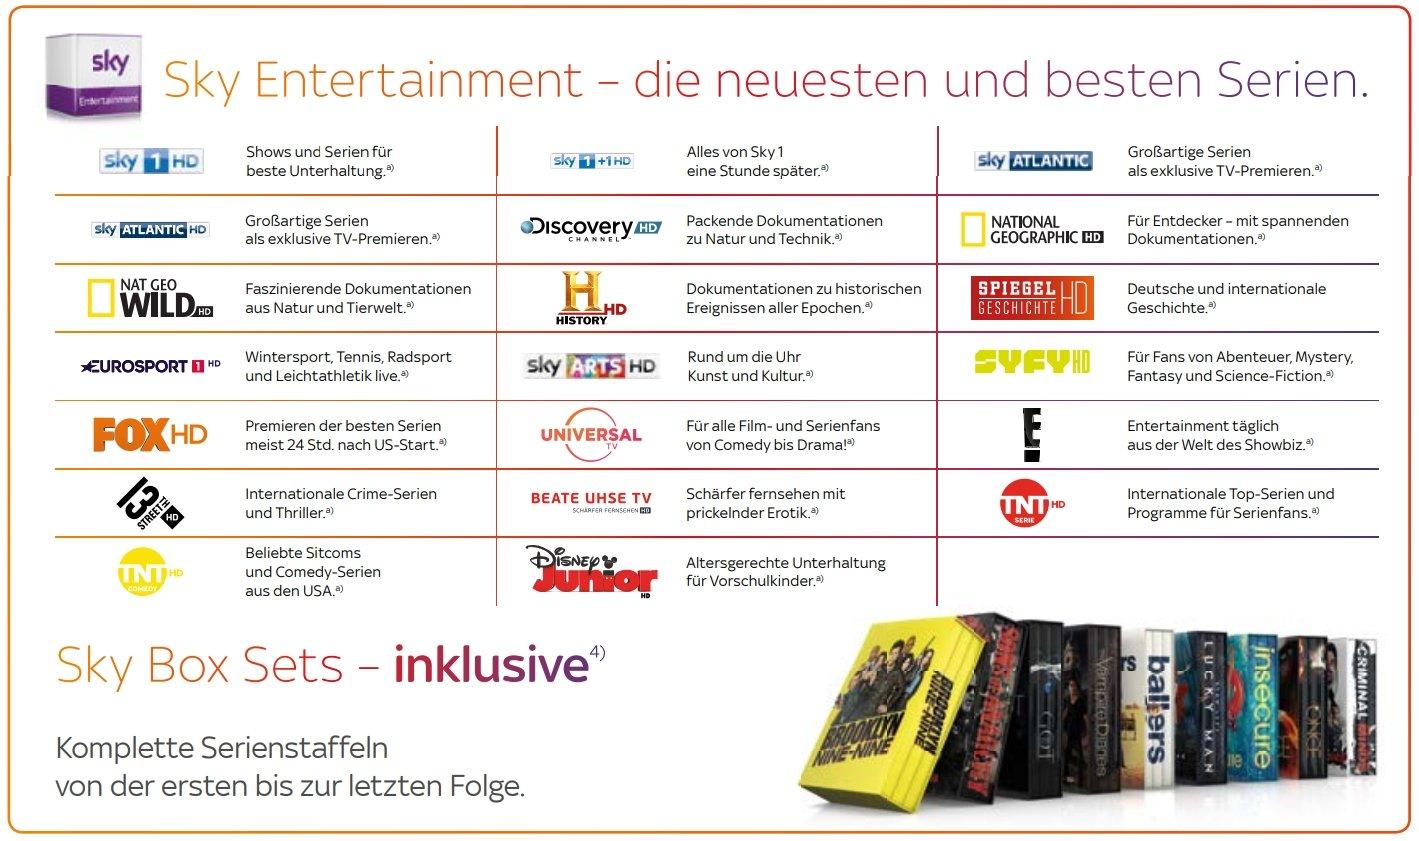 sky-sender-entertainment-paket